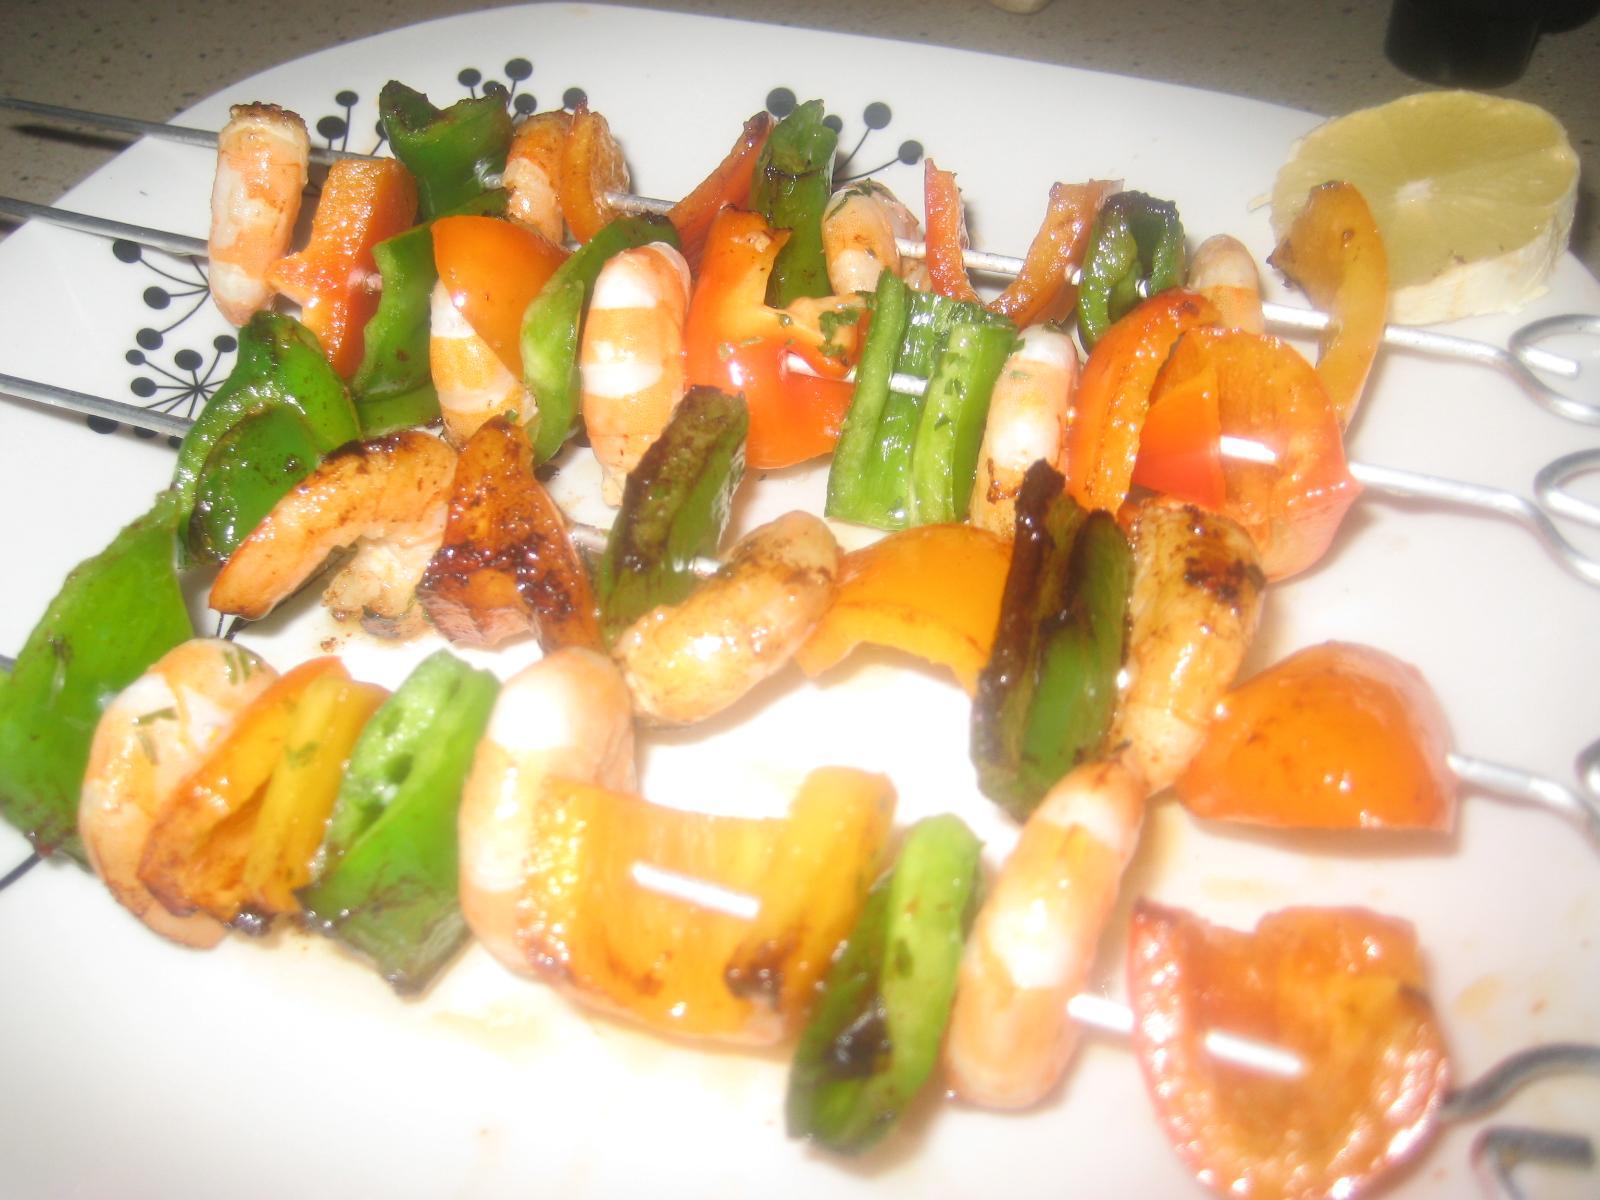 Brocheta de langostinos con verduras la cocina con mimo - Brocheta de langostinos y bacon ...